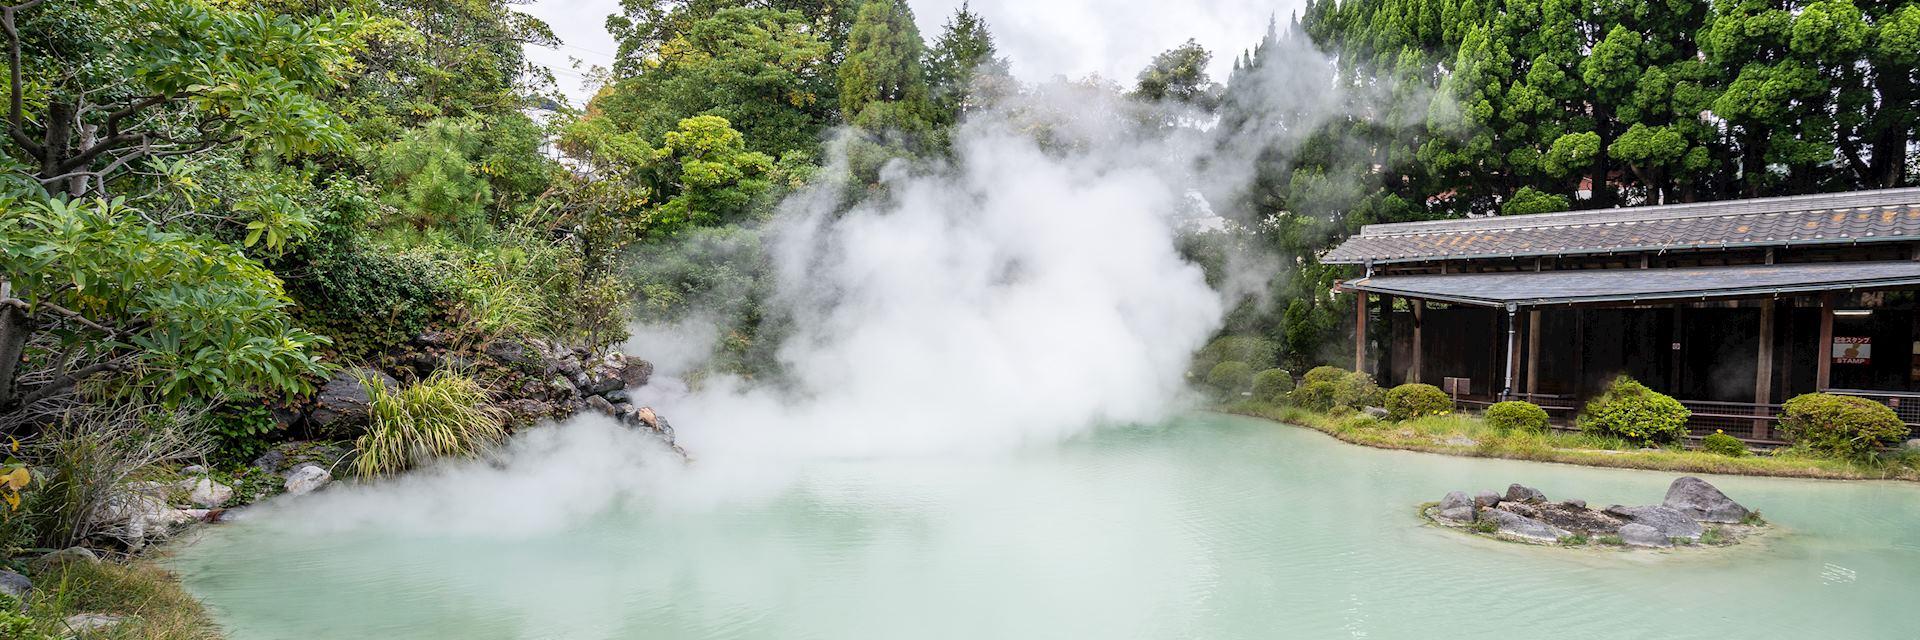 Natural hot spring in Beppu